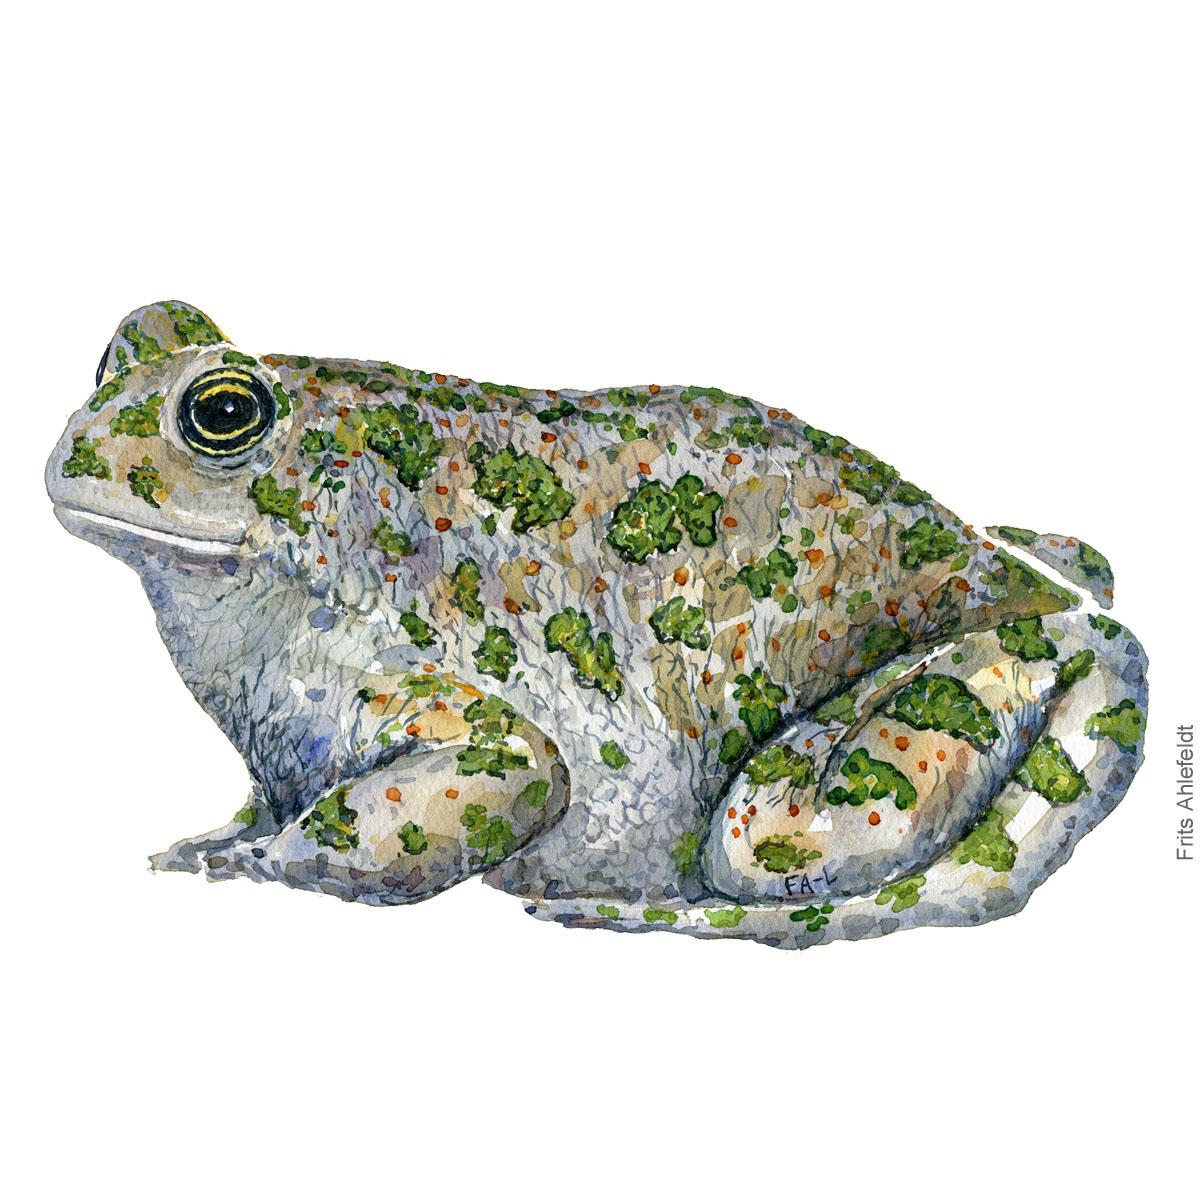 Groenbroget tudse - Bufo viridis - Green toad watercolor illustration by Frits Ahlefeldt - Akvarel af padde